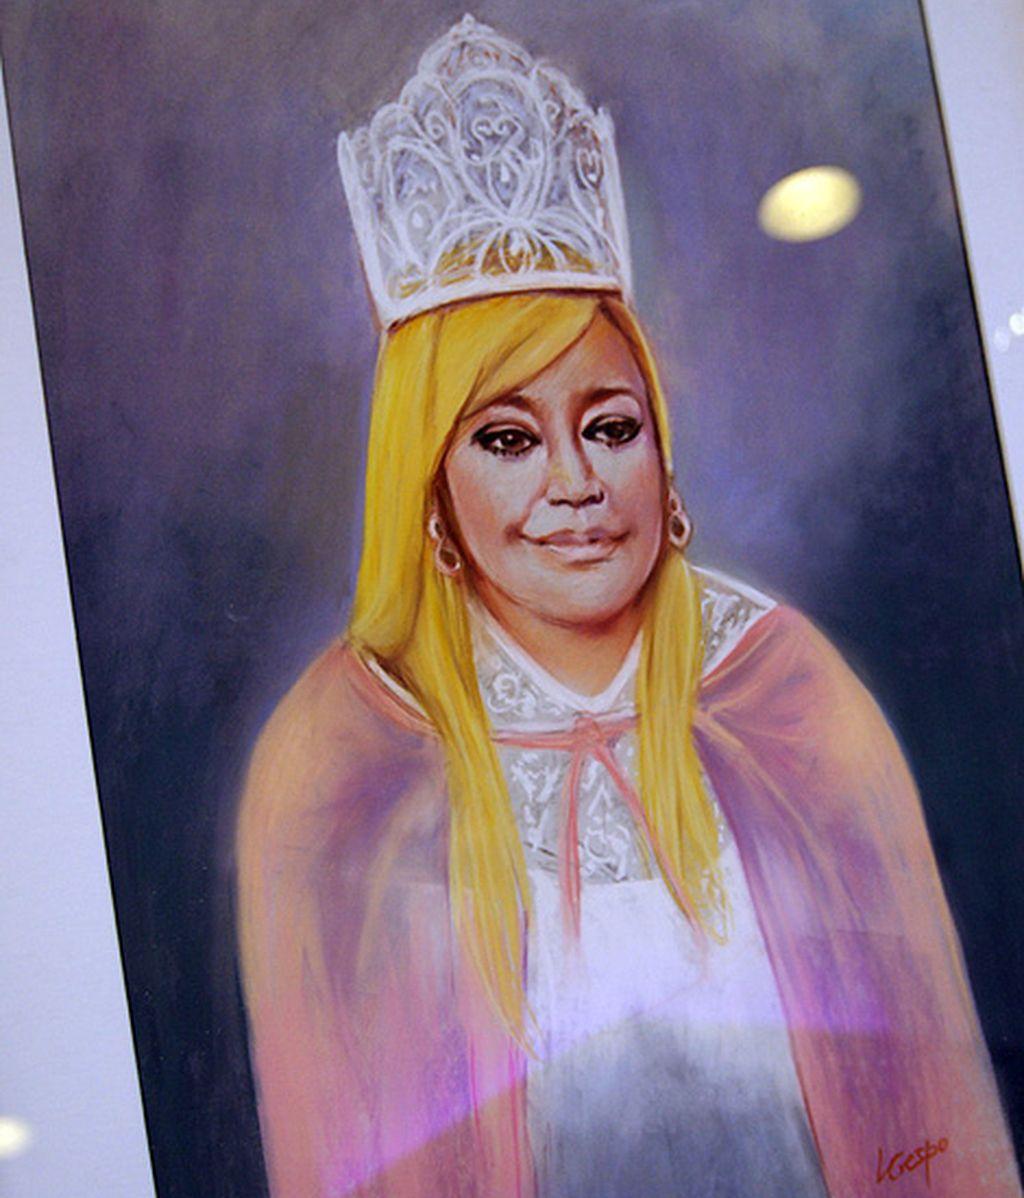 El retrato de la reina de 'Sálvame'